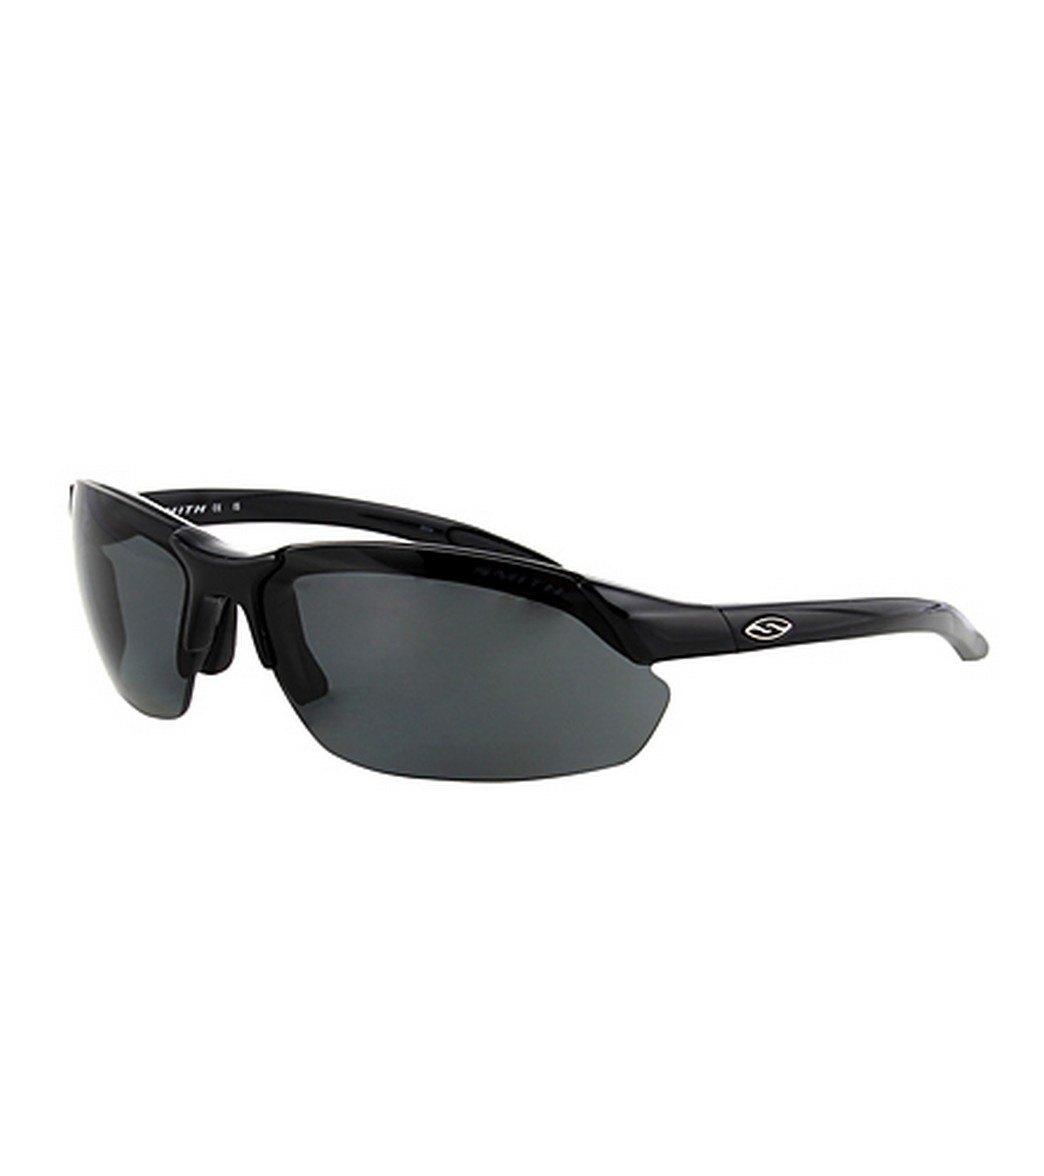 e9eca9f06f Smith Optics Parallel Max Sunglasses at SwimOutlet.com - Free Shipping